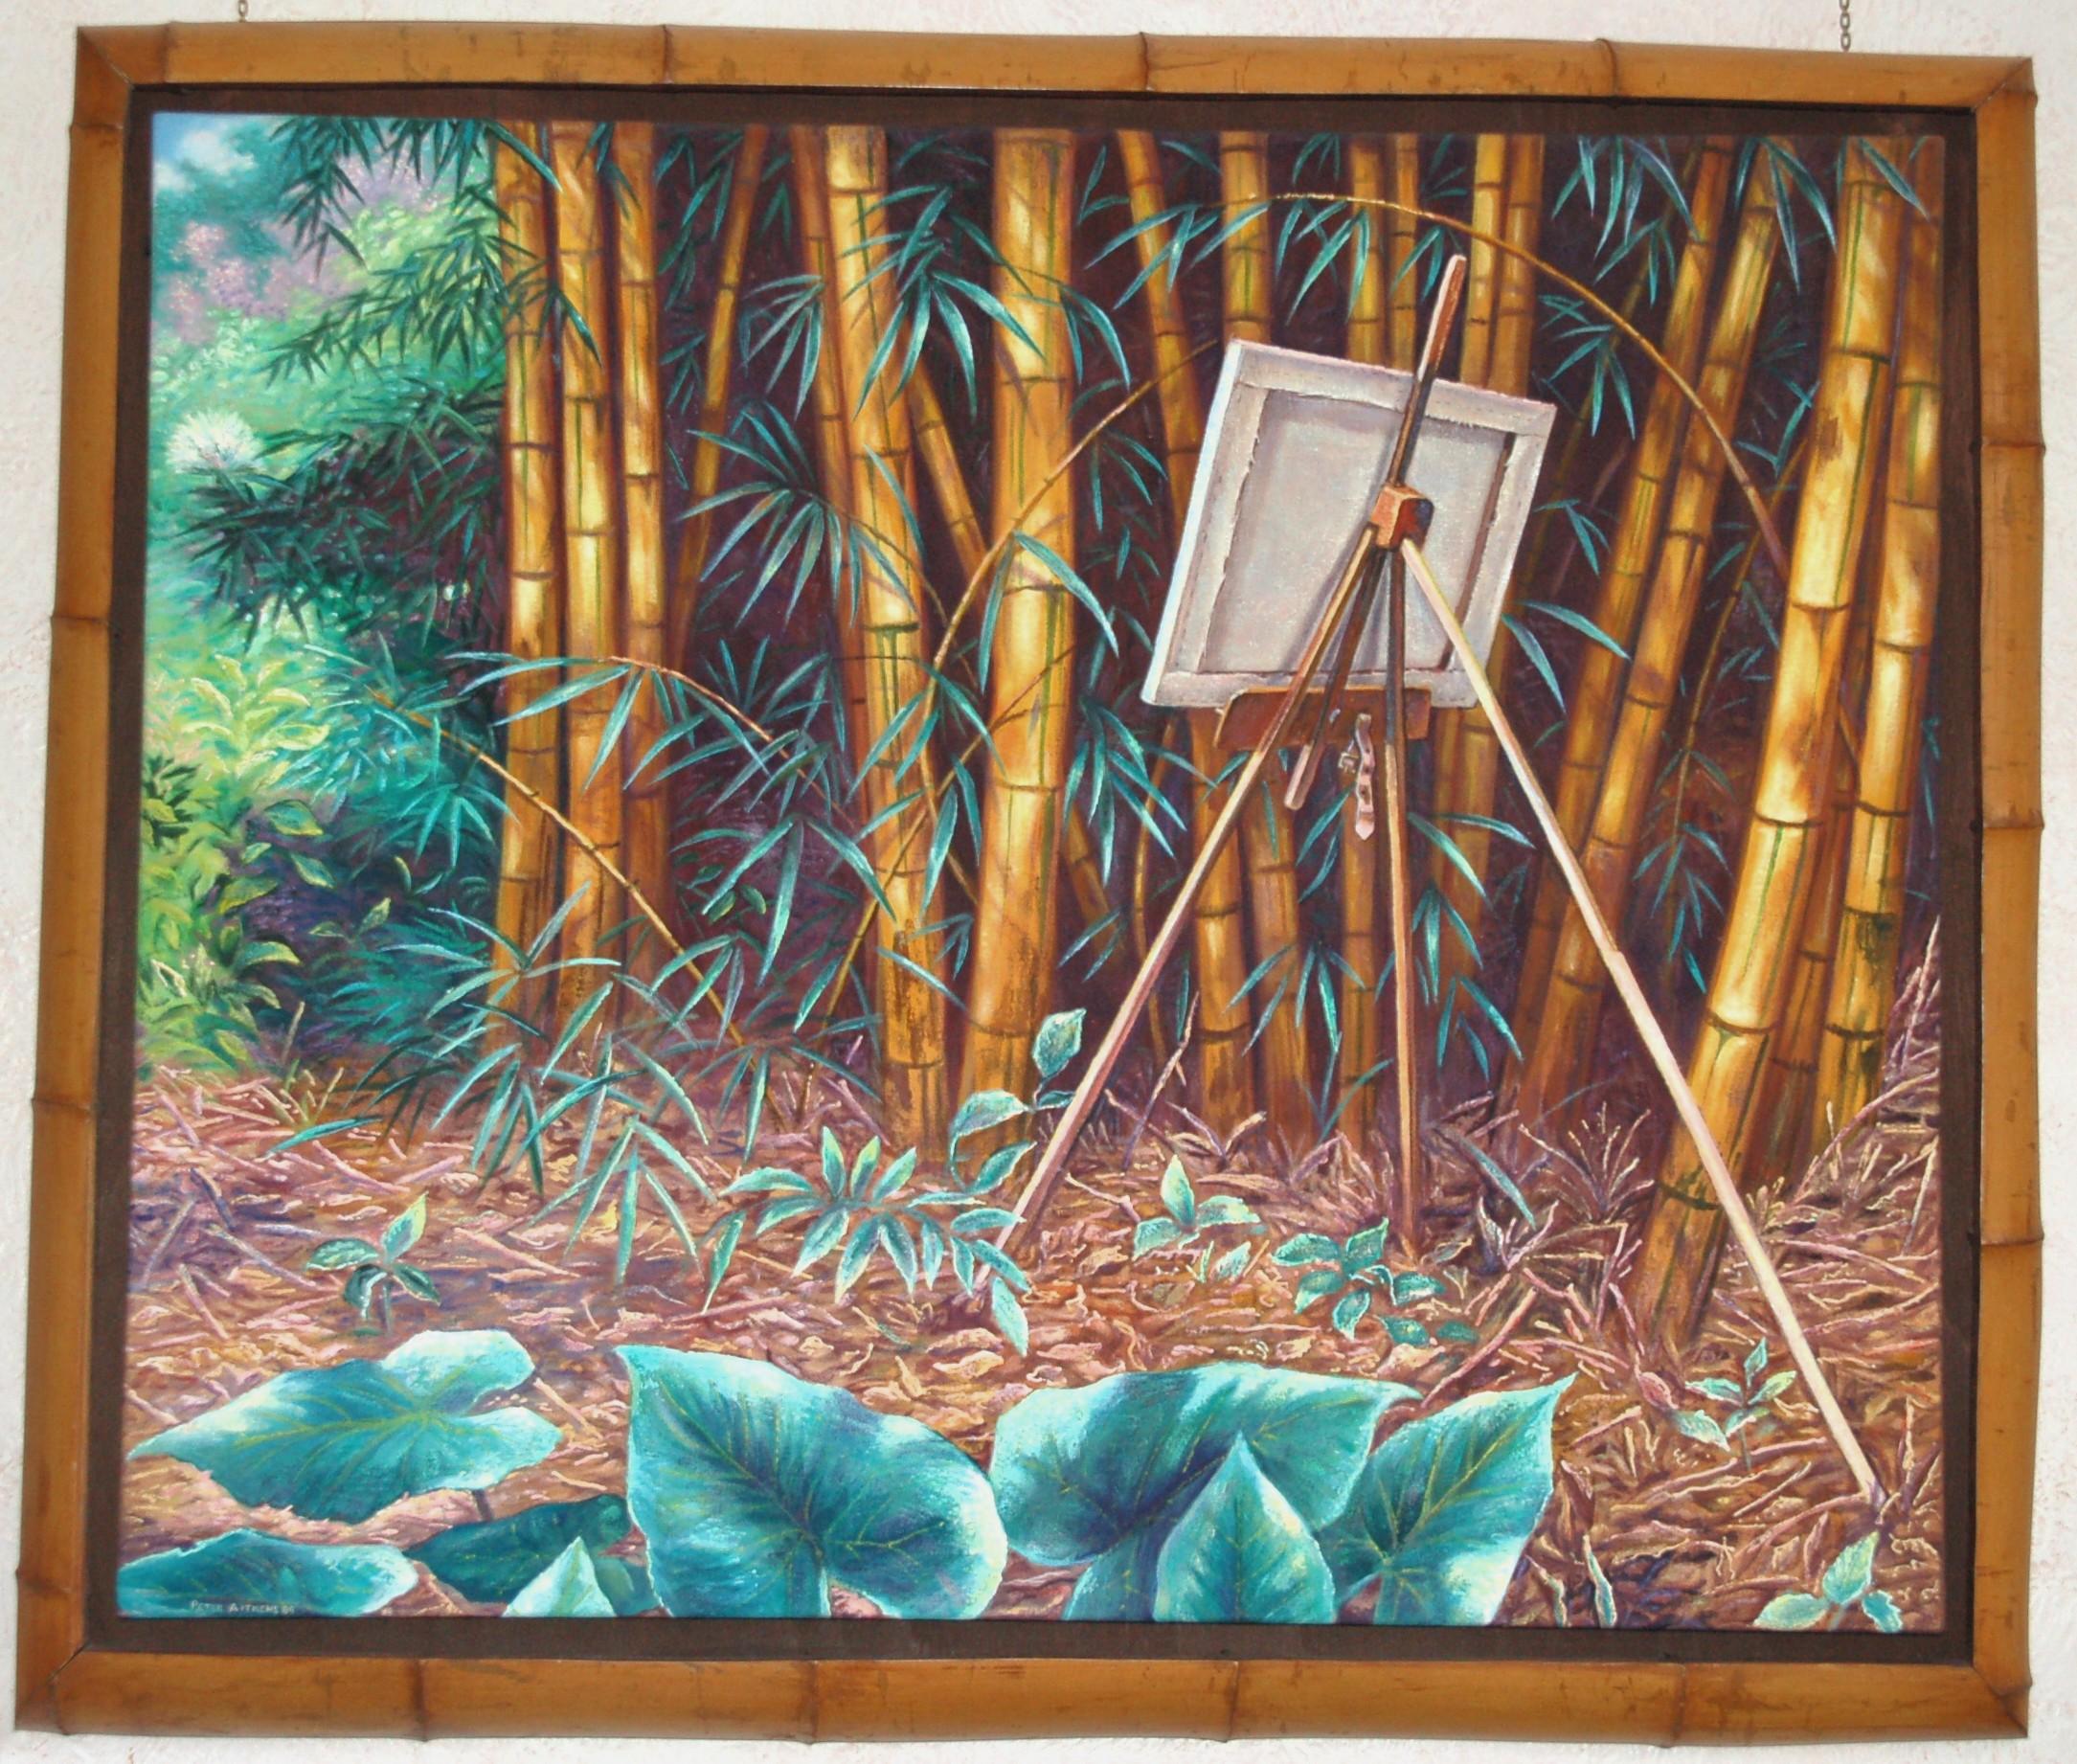 The Artist in His Studio